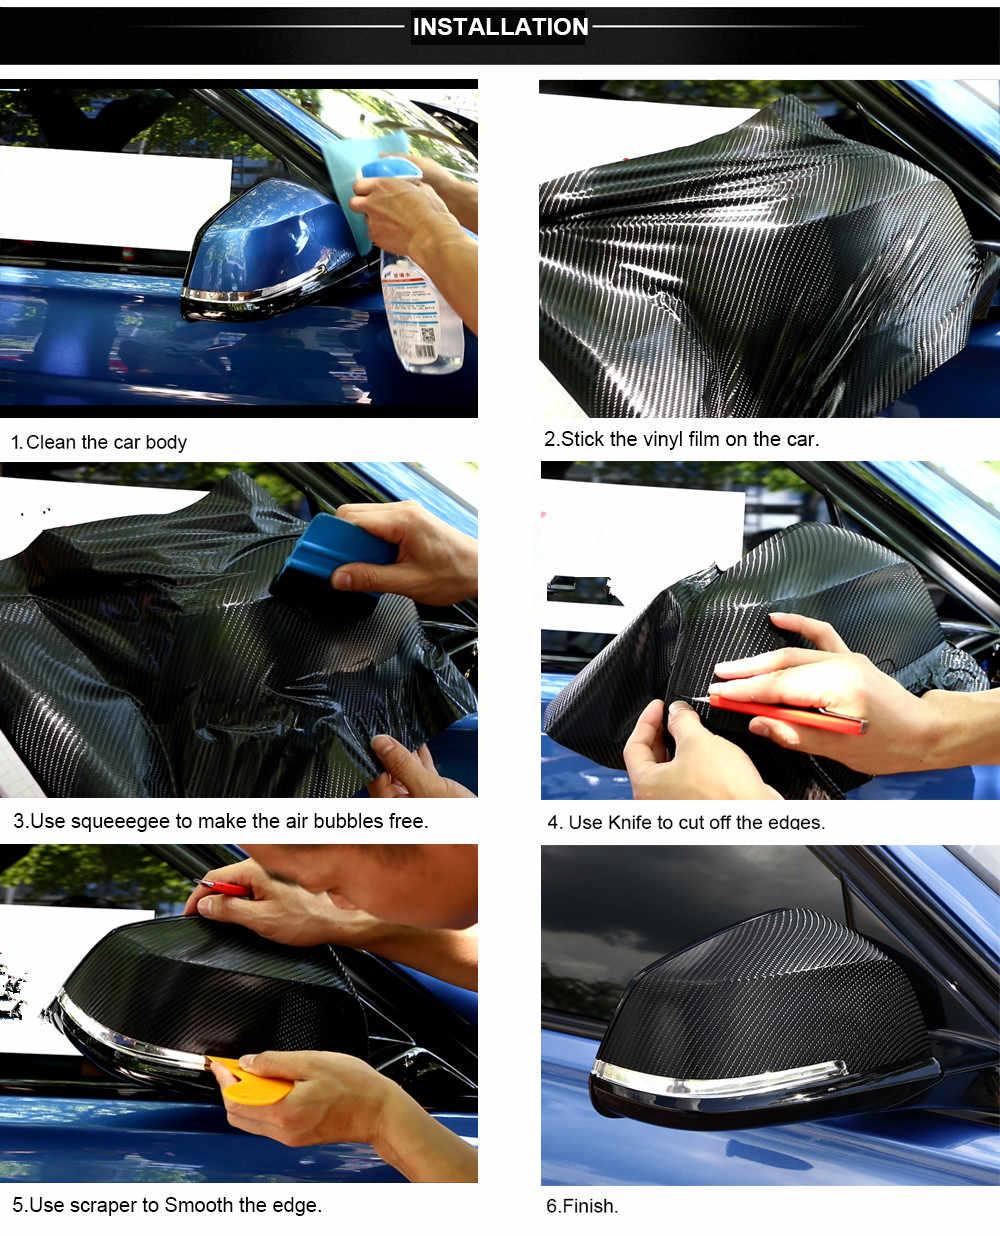 30x127 см 3D 5D автомобильная пленка из углеродного волокна Наклейка для Toyota Tacoma Tercel Tiara Van Venza Yaris Hiace Prius V Hilux Land Cruis